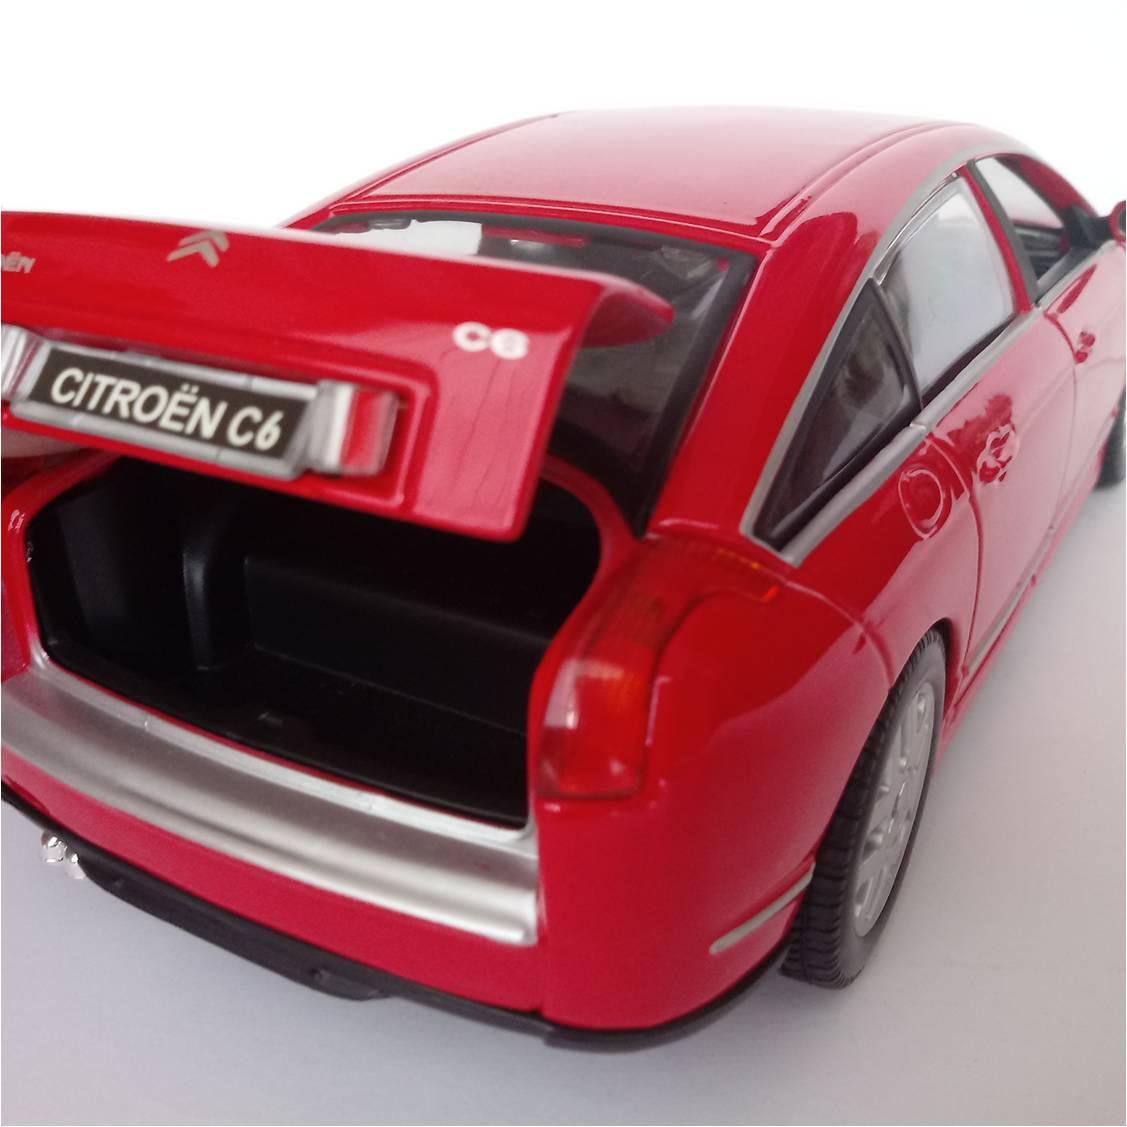 Miniatura Citroen C6 - Bburago - Escala 1/20 - 10628